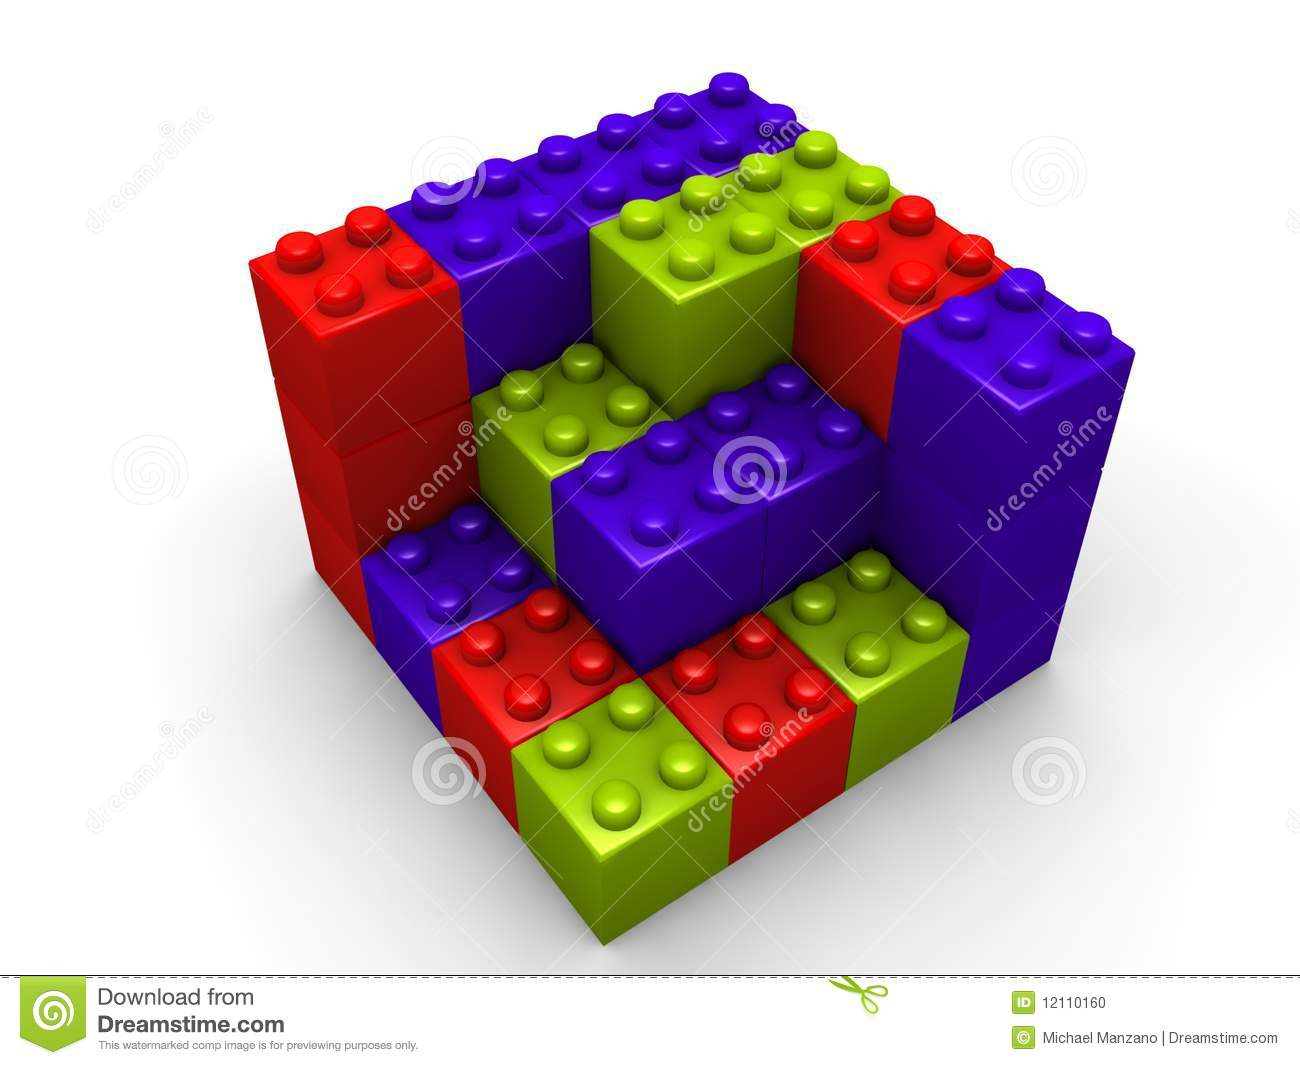 Lego building blocks clipart image Lego Blocks Stock Illustrations – 303 Lego Blocks Stock ... image